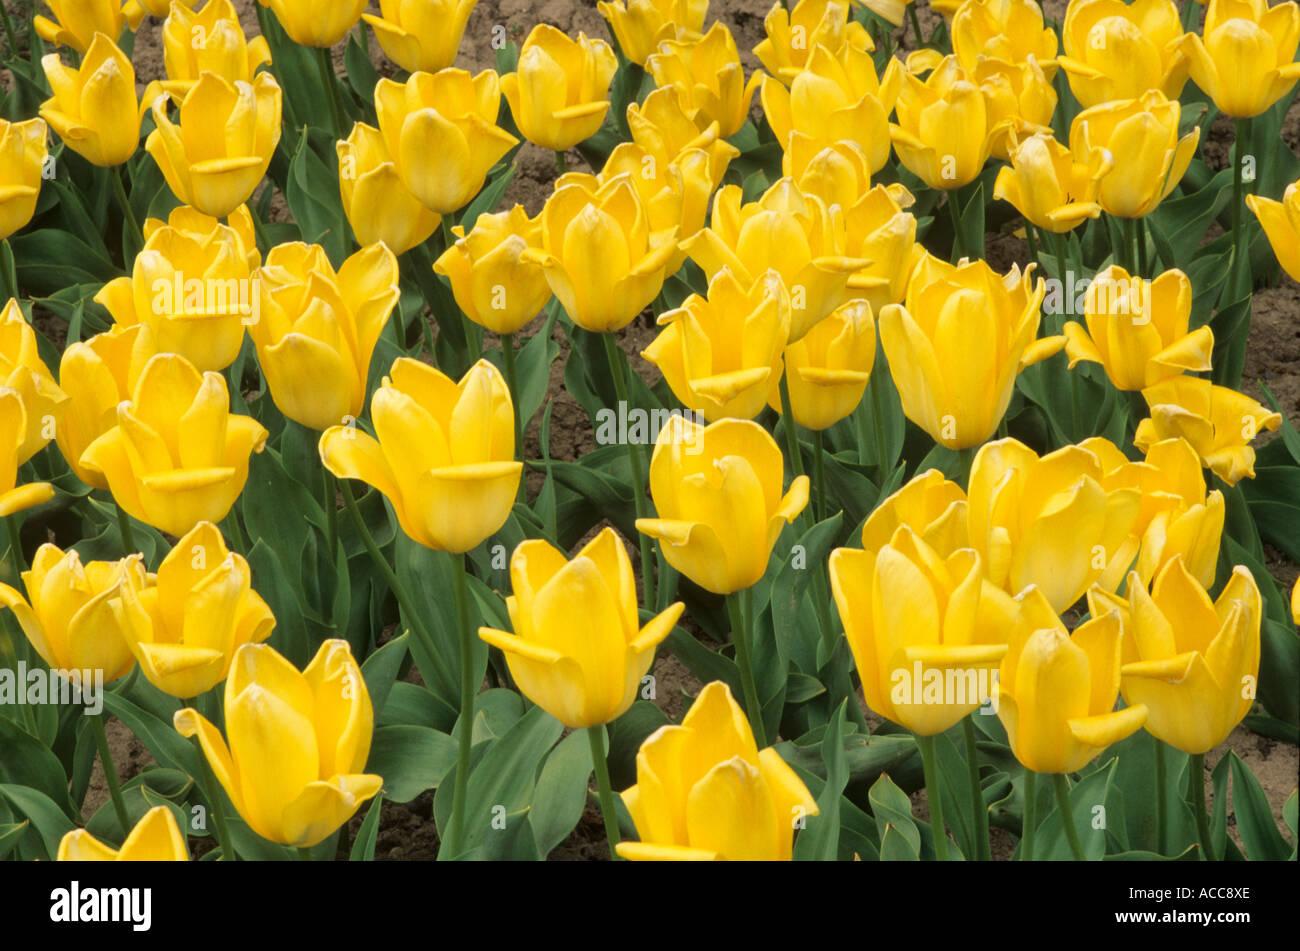 Tulipa 'Candela', div. 13 - Stock Image